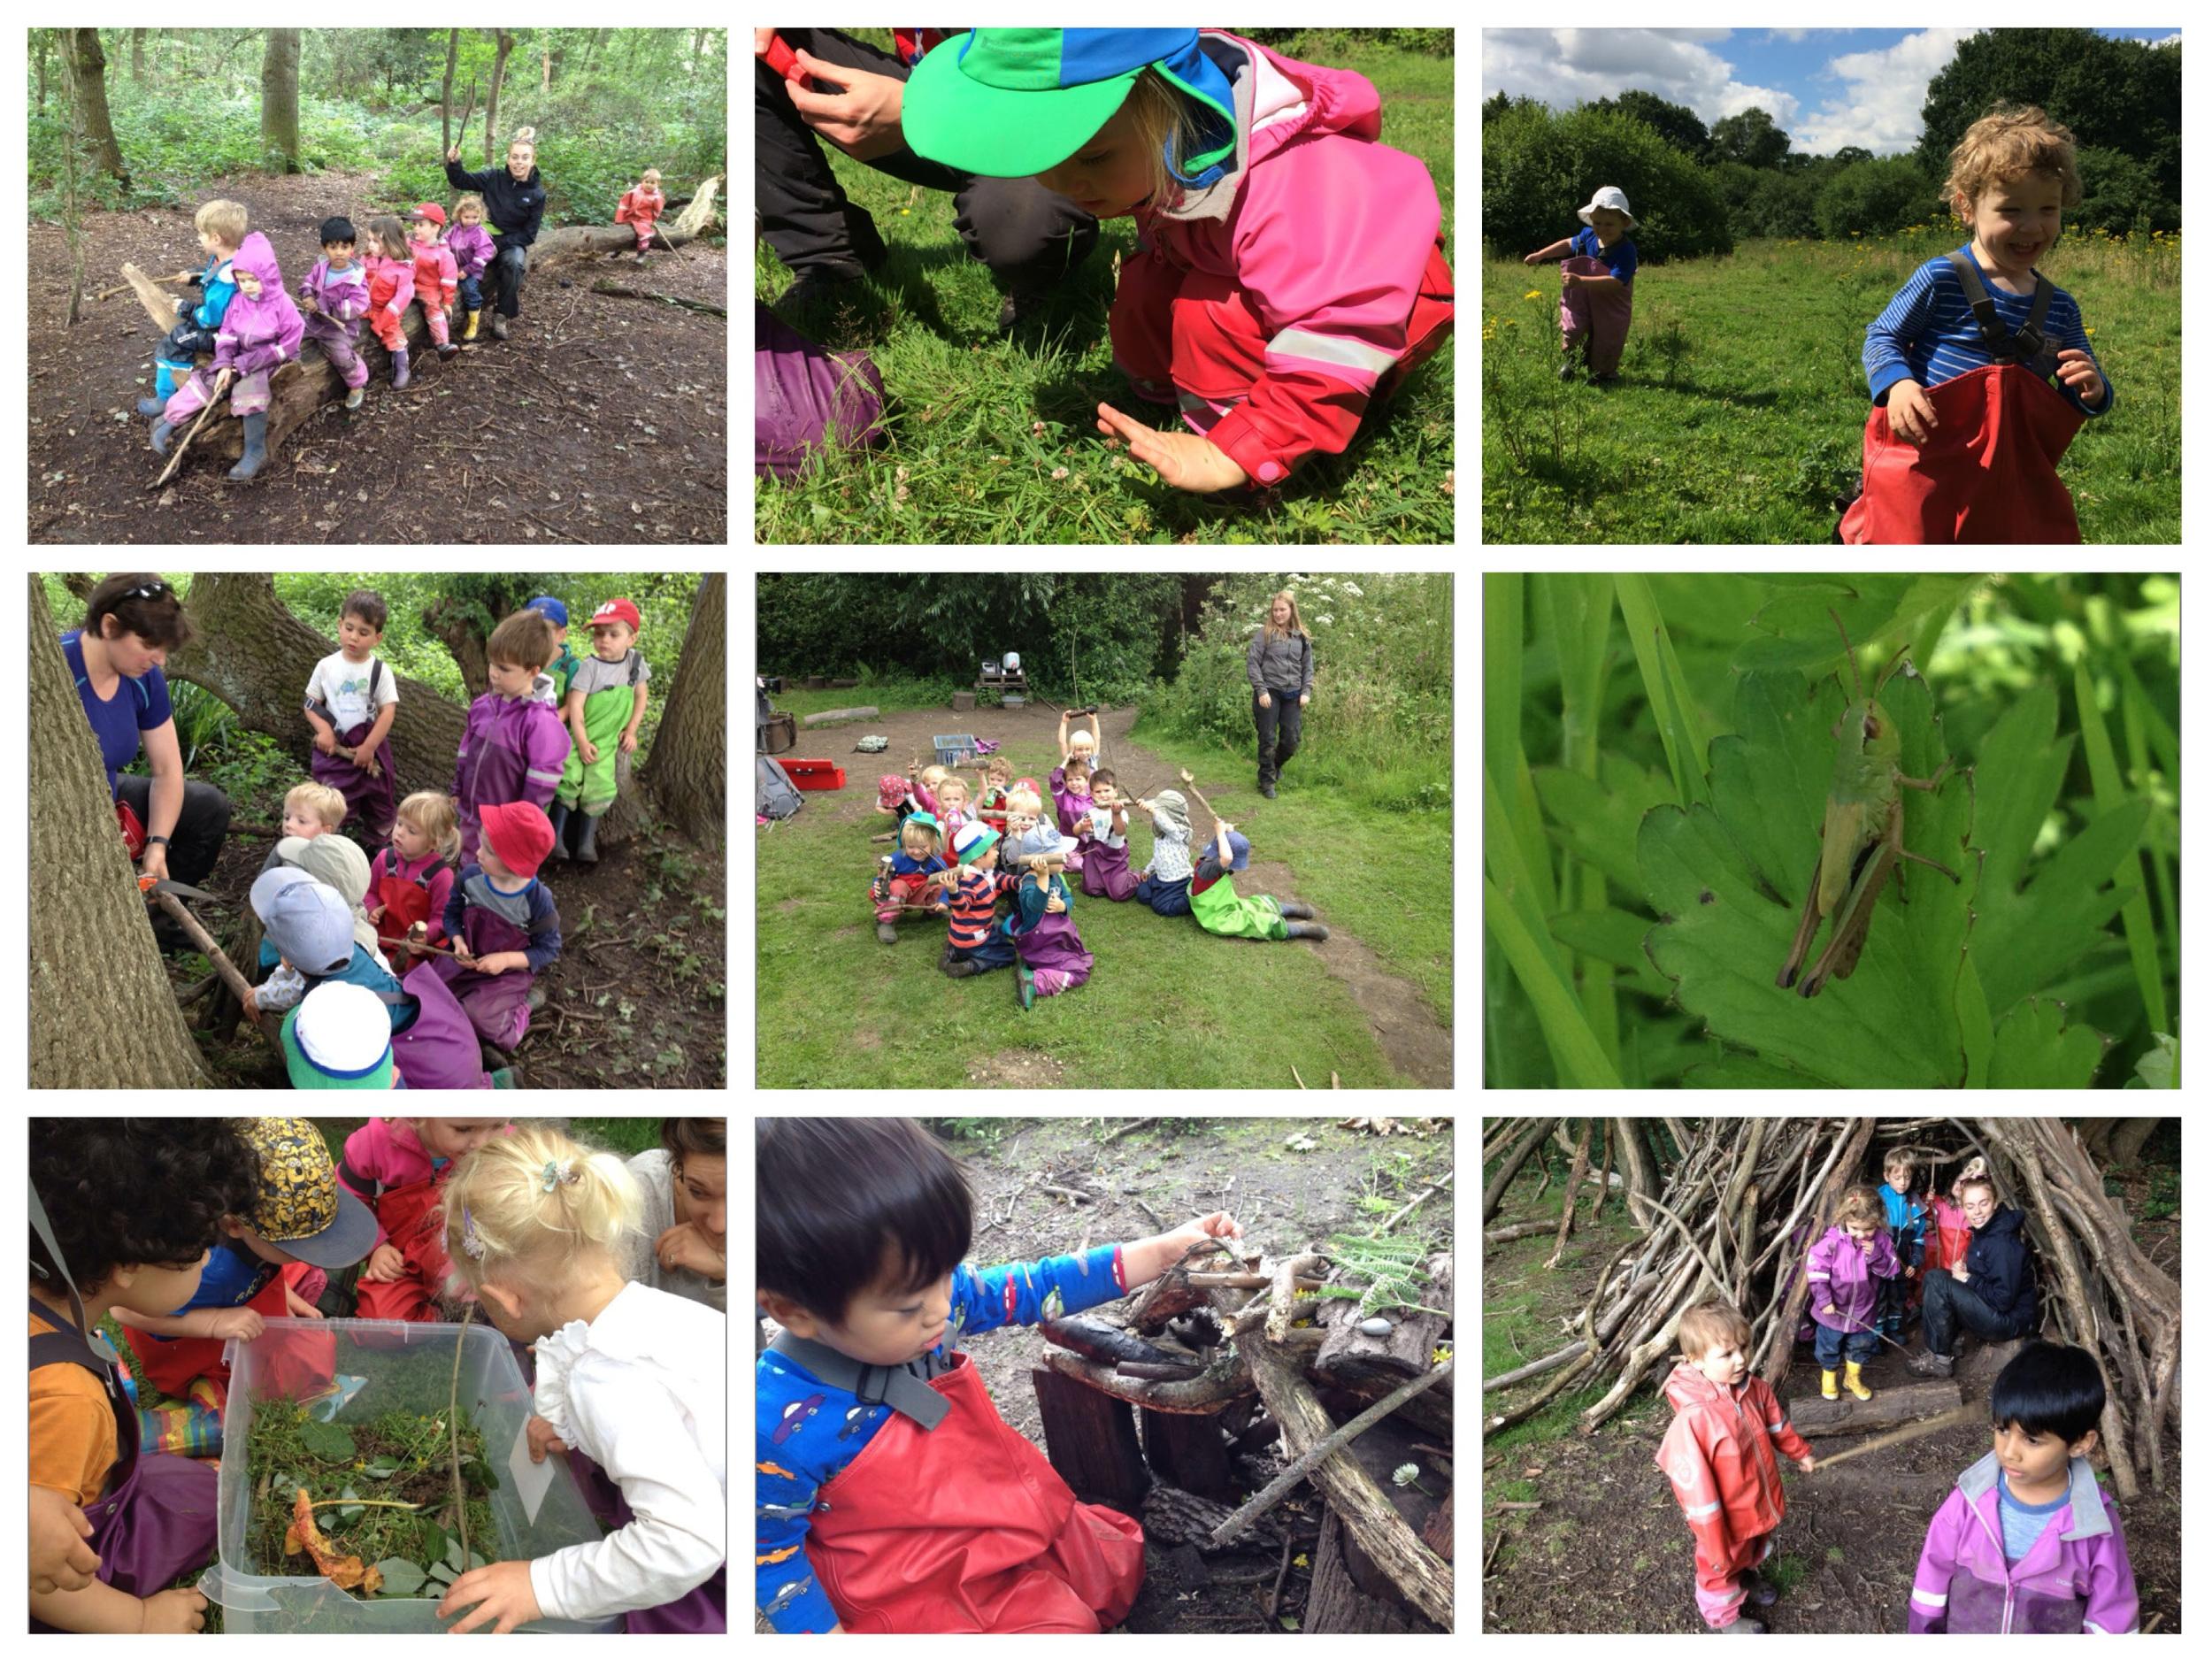 Busy week of outdoor fun